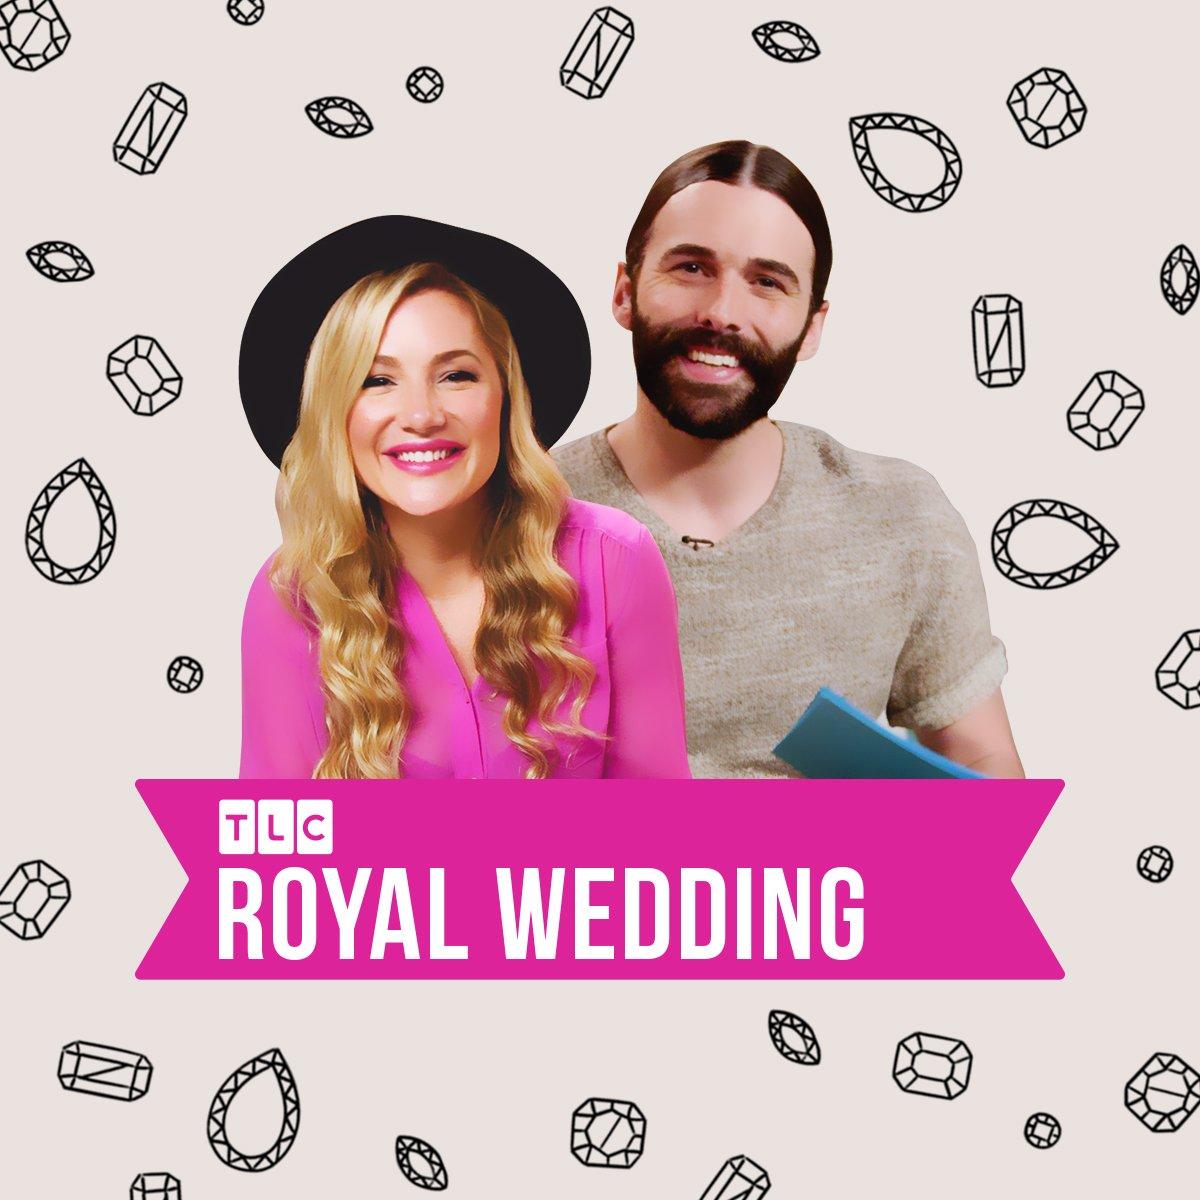 Lujoso Say Yes To The Dress Bridesmaids Online Regalo - Ideas de ...